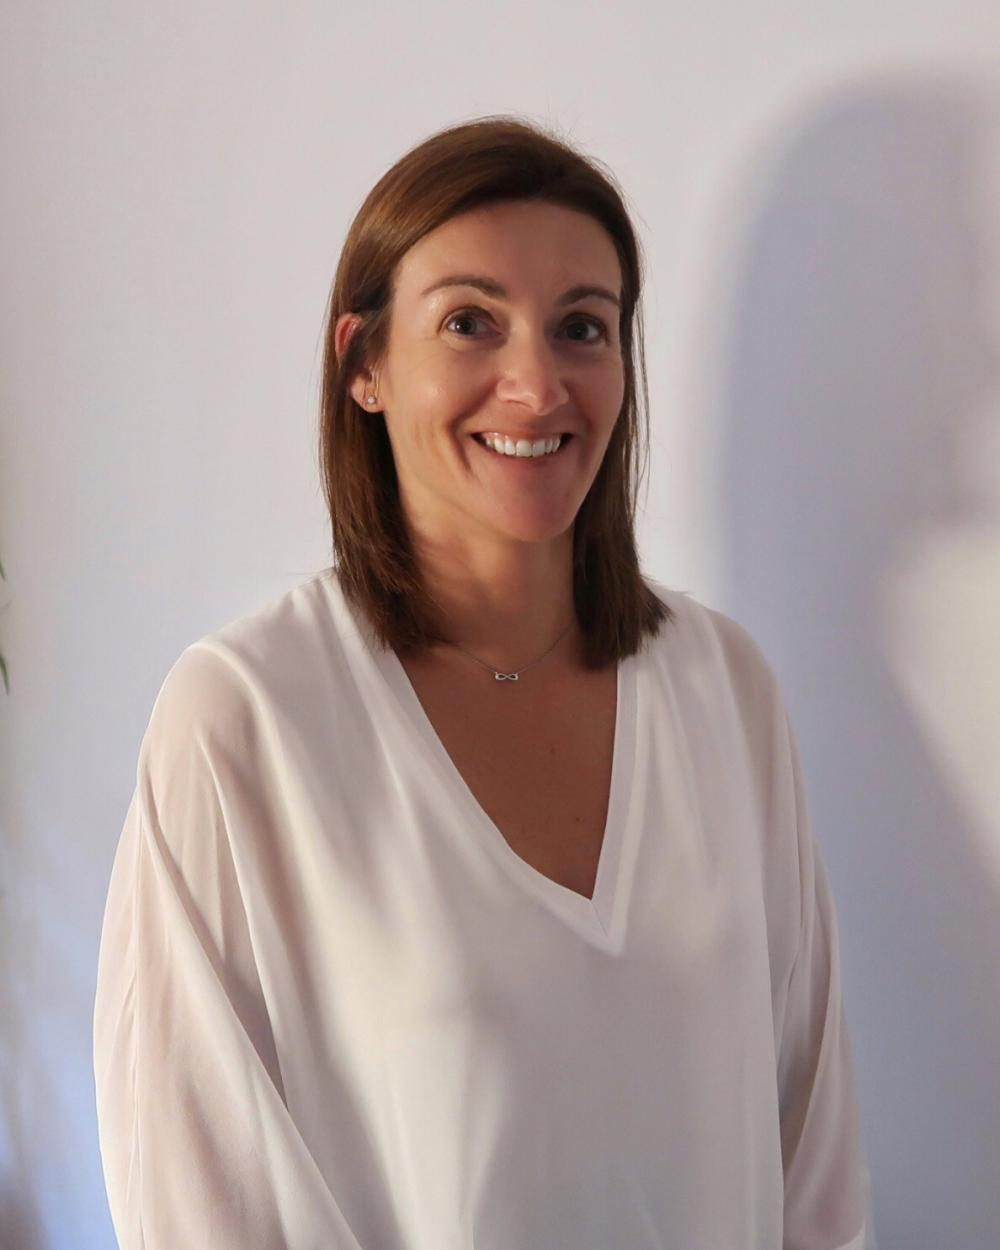 Nicola Langley